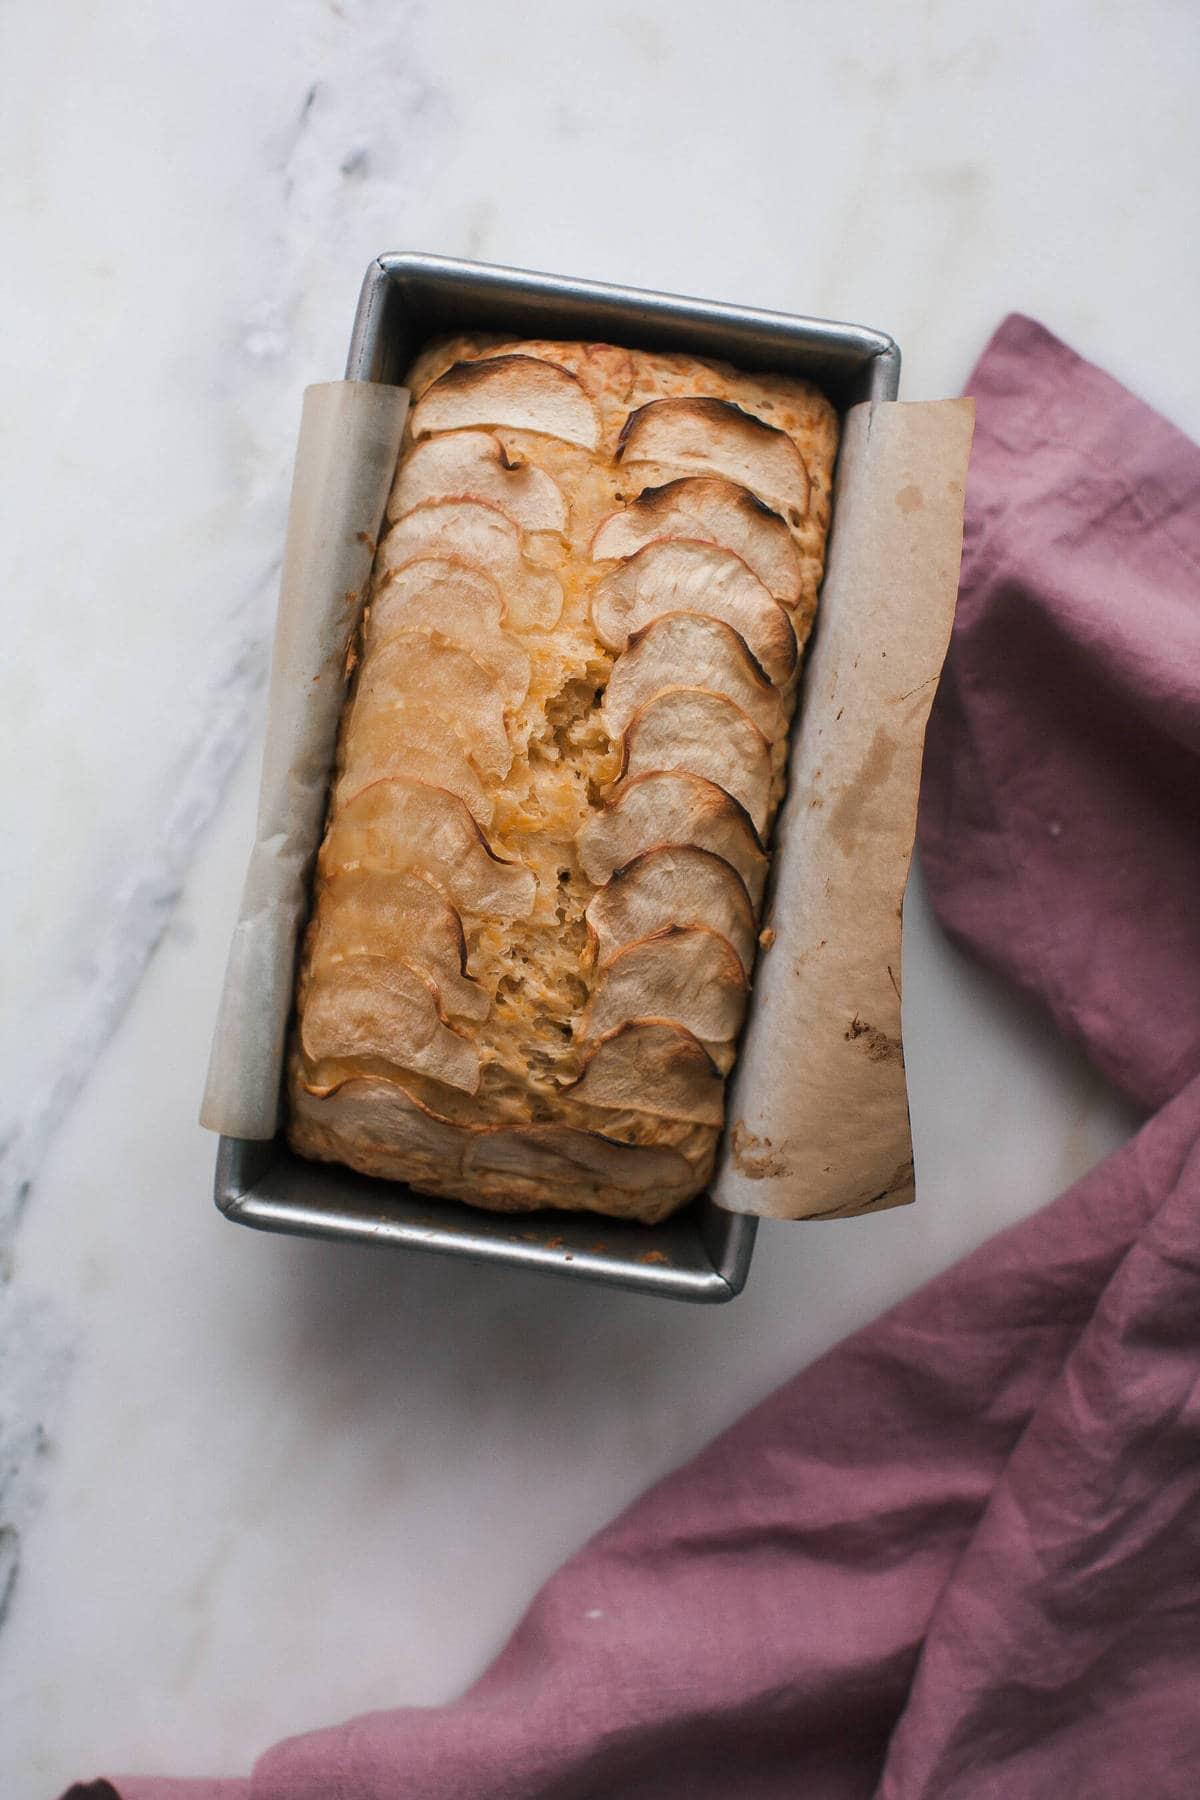 Apple Cider Cheddar Bread